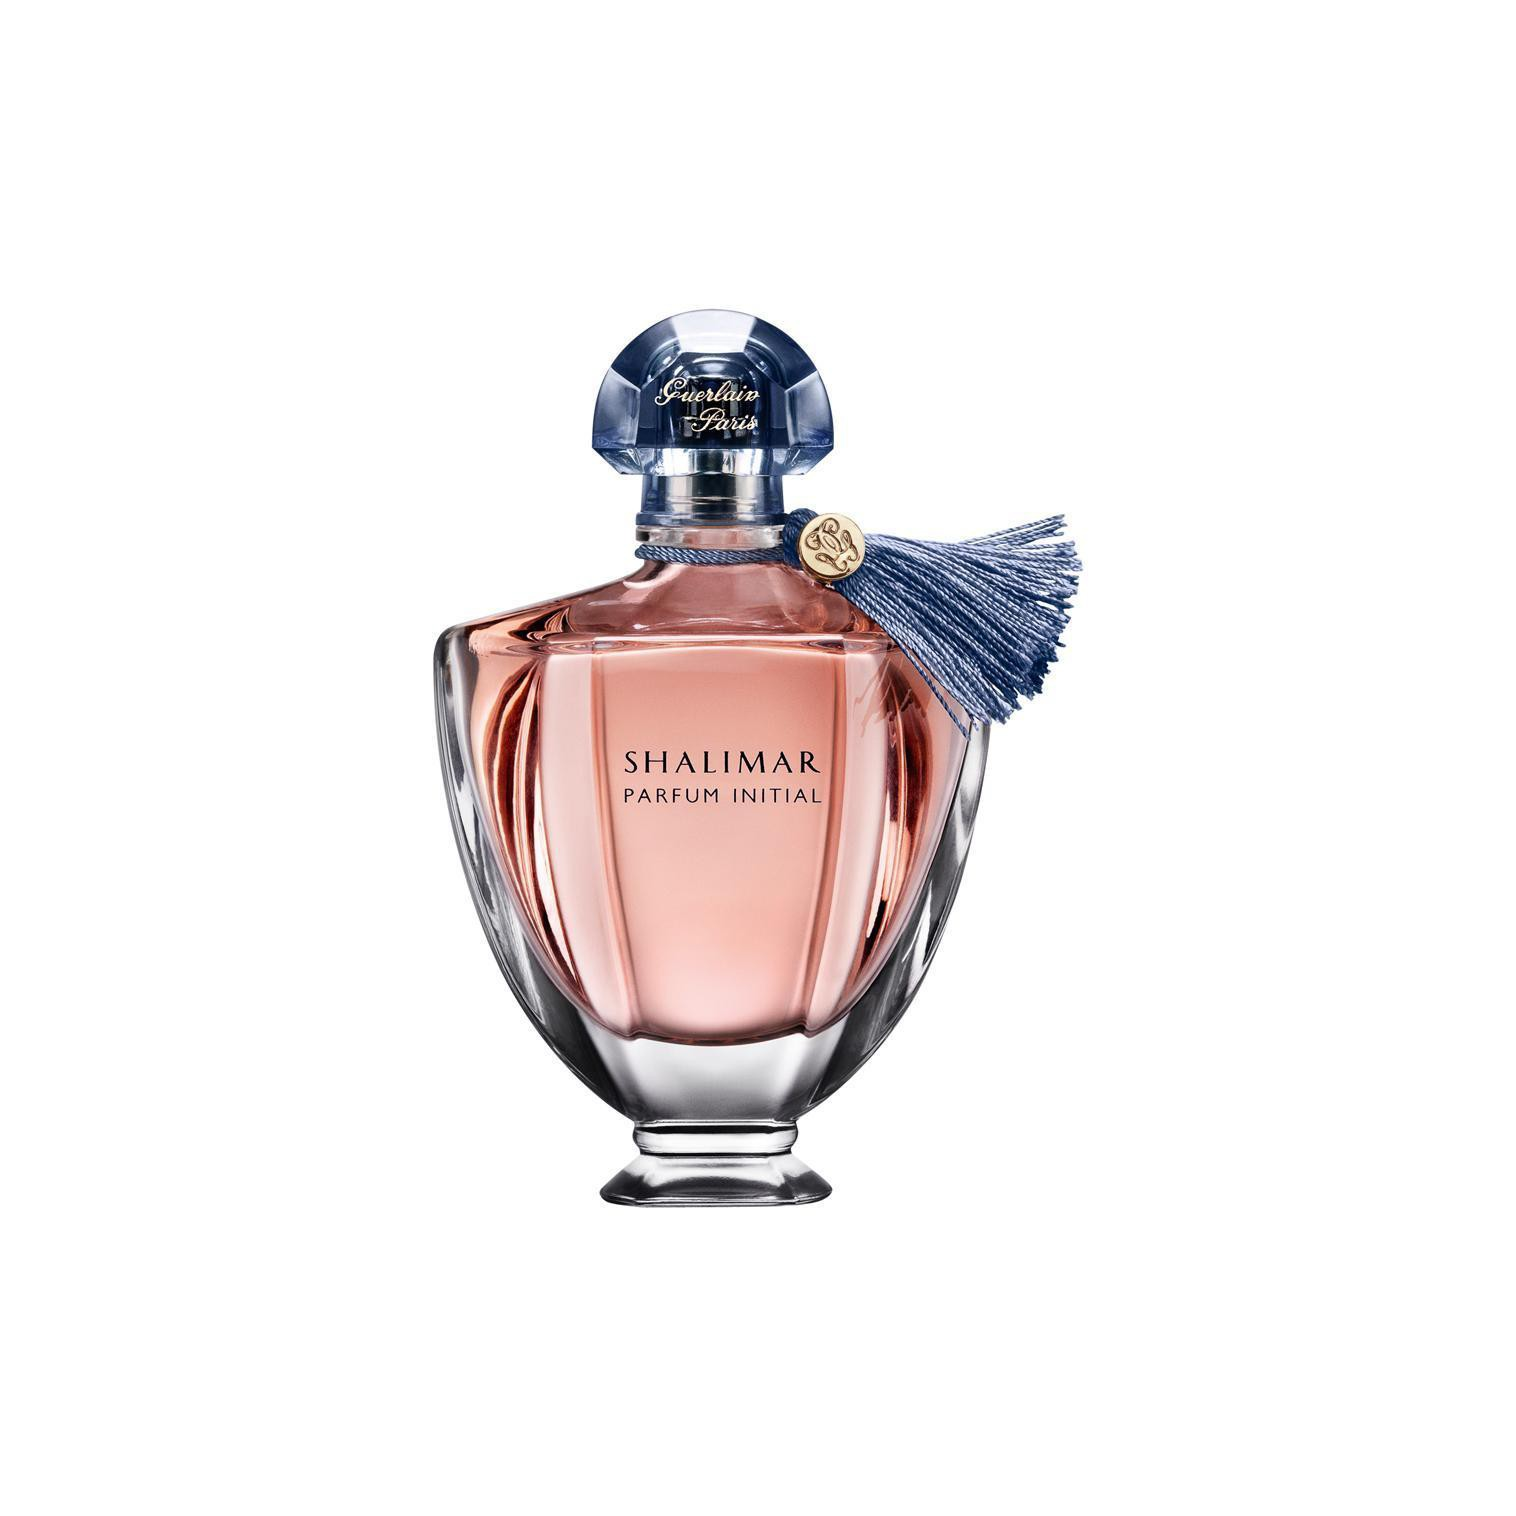 Guerlain Shalimar Parfum Initial аромат для женщин